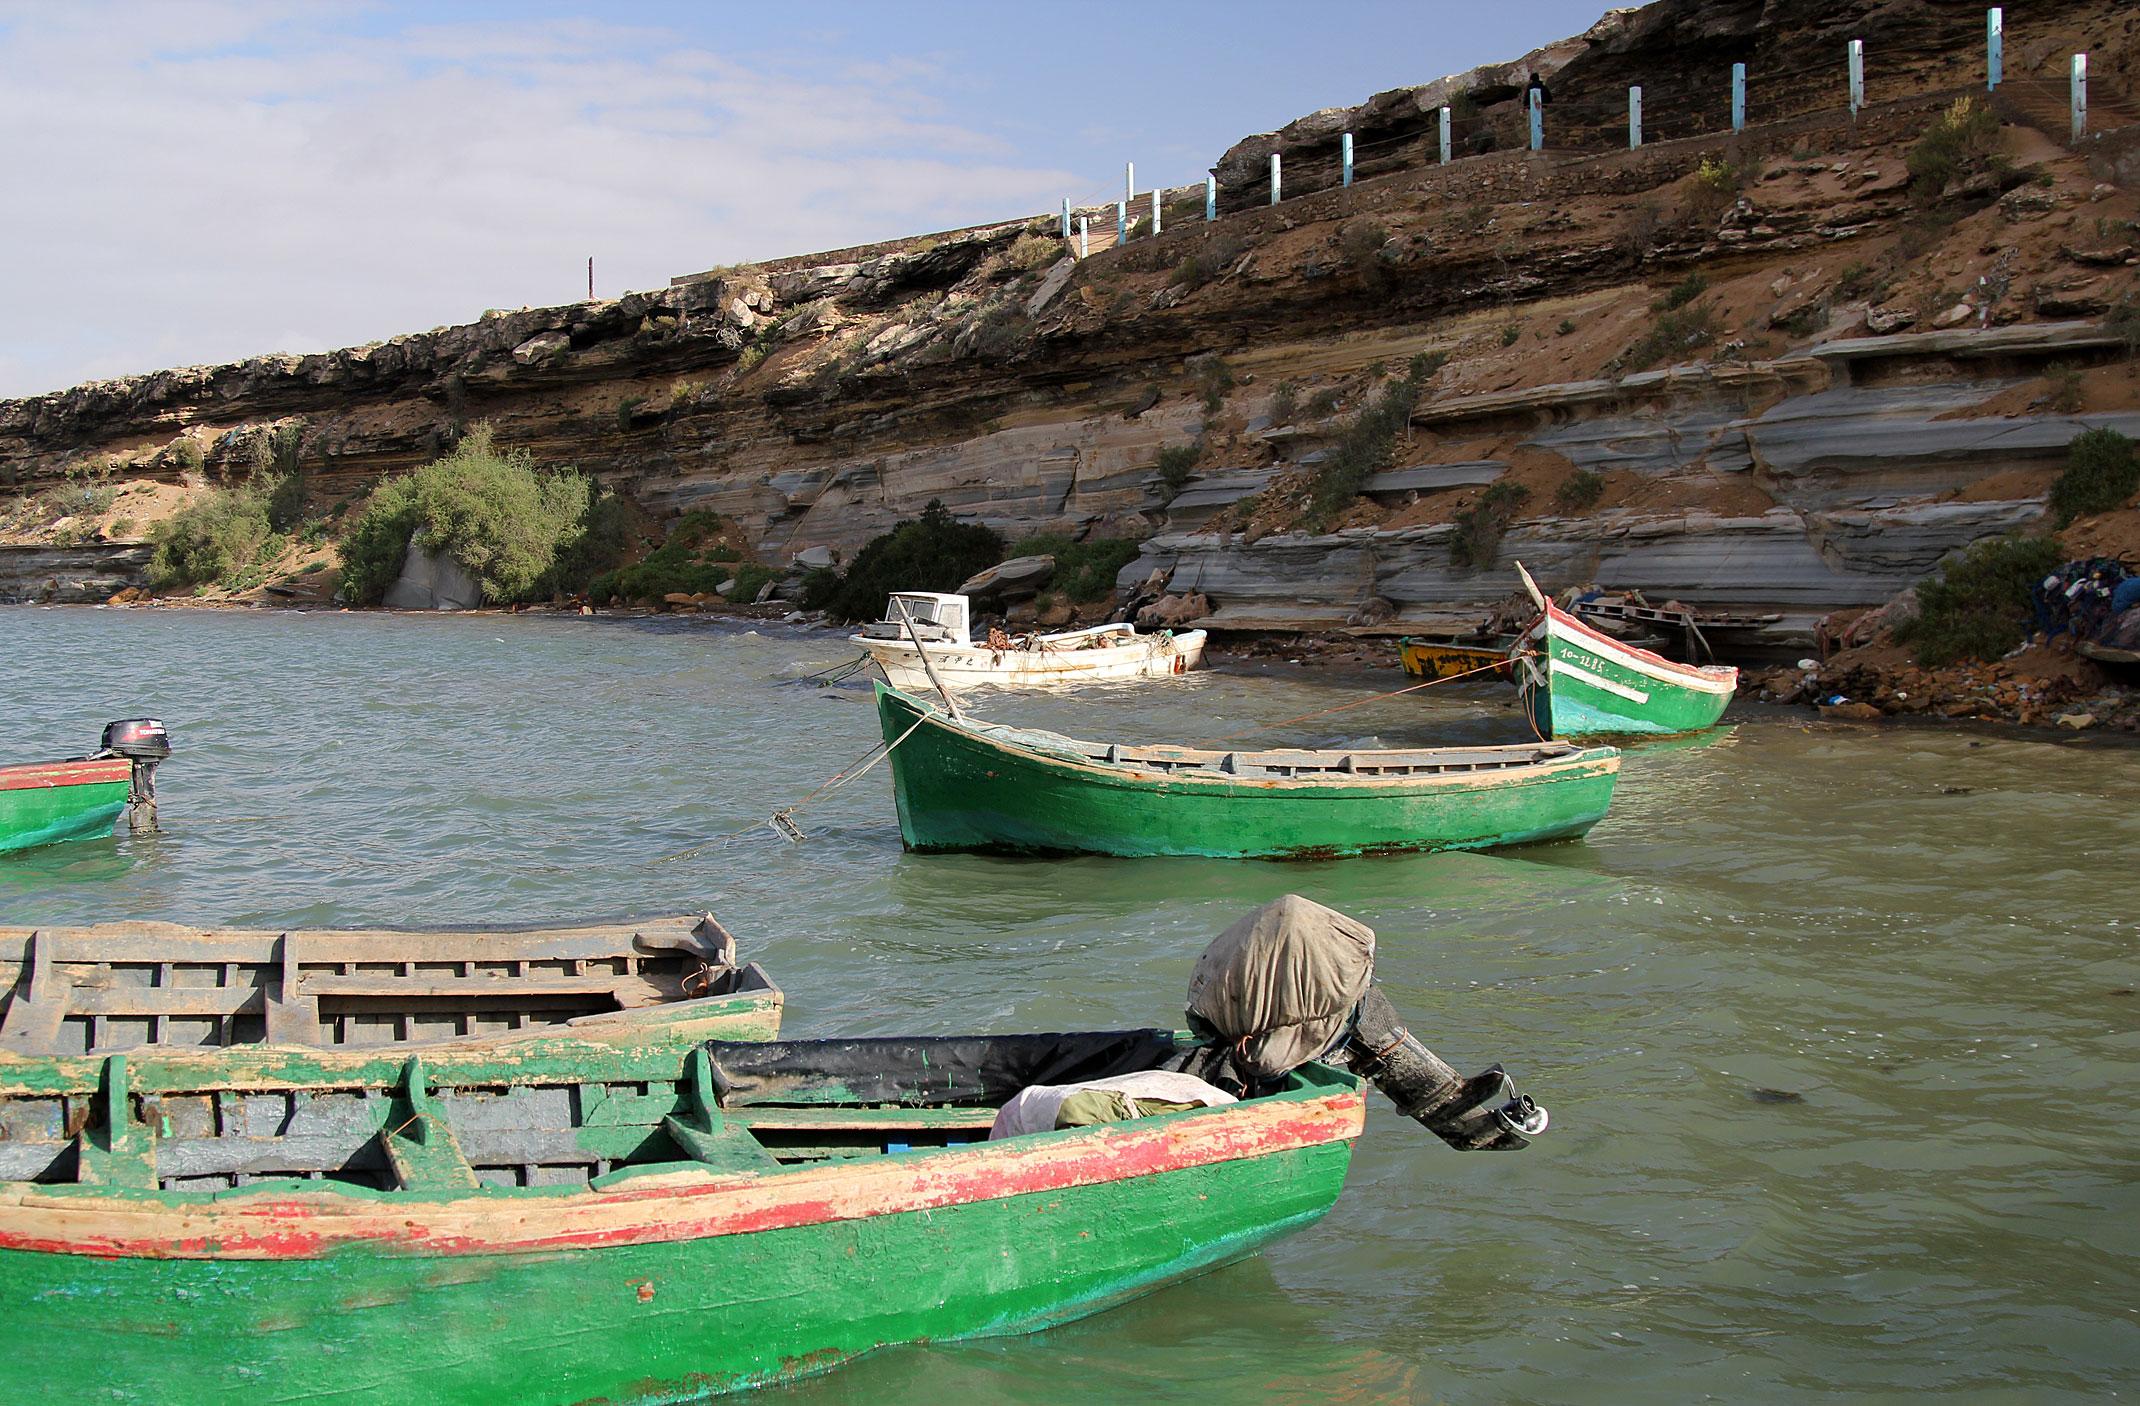 Maroko.Laguna Khenifiss